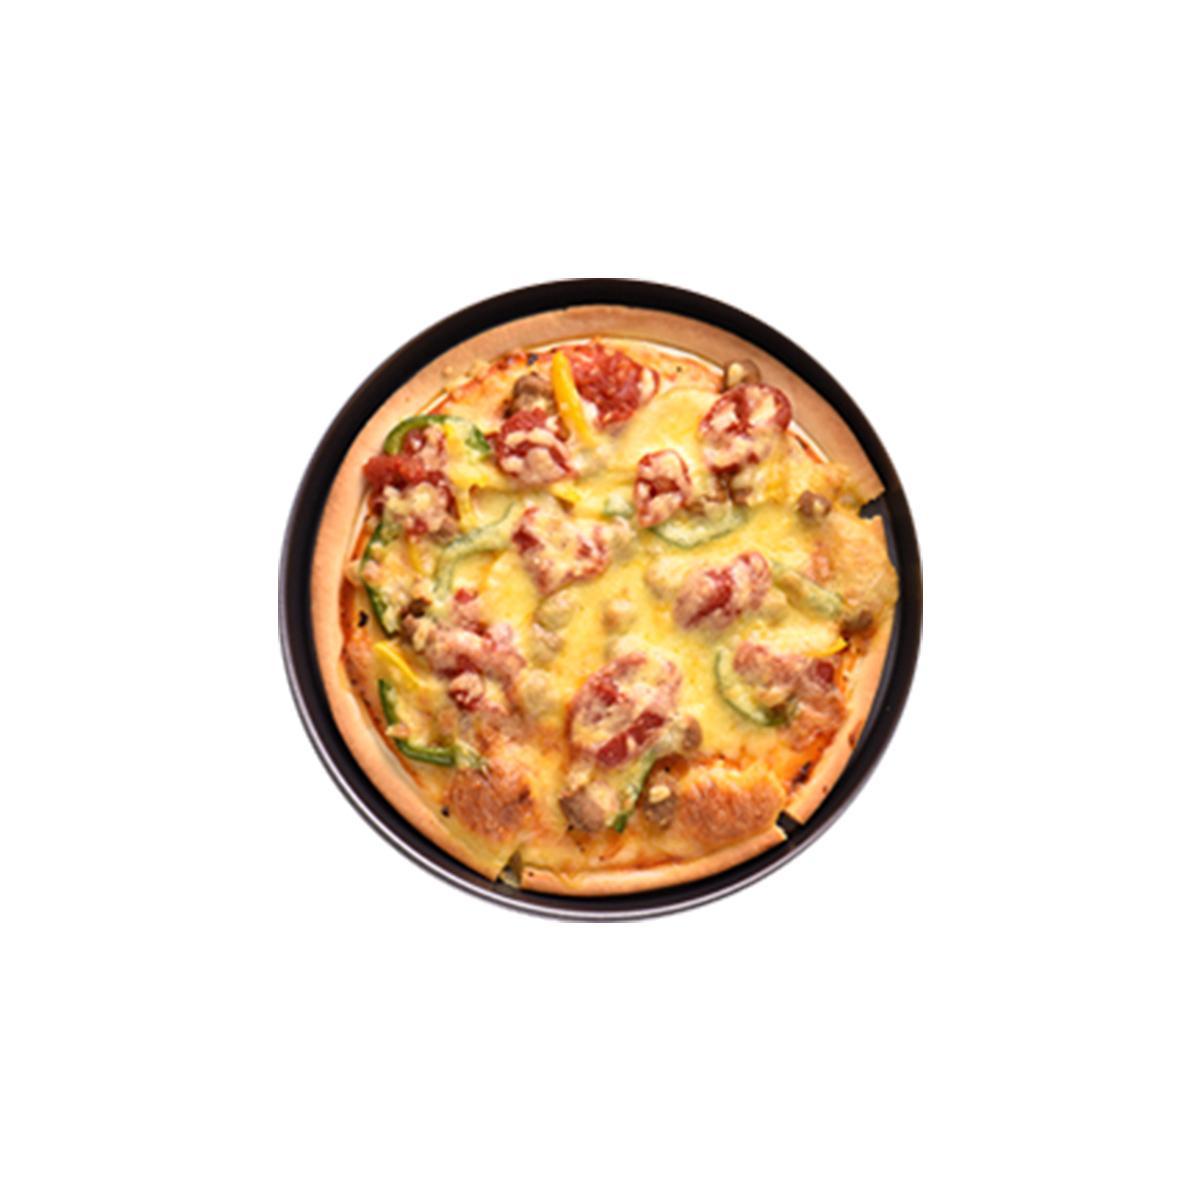 Midea/美的 烤箱披萨盘赠品 说明书.pdf